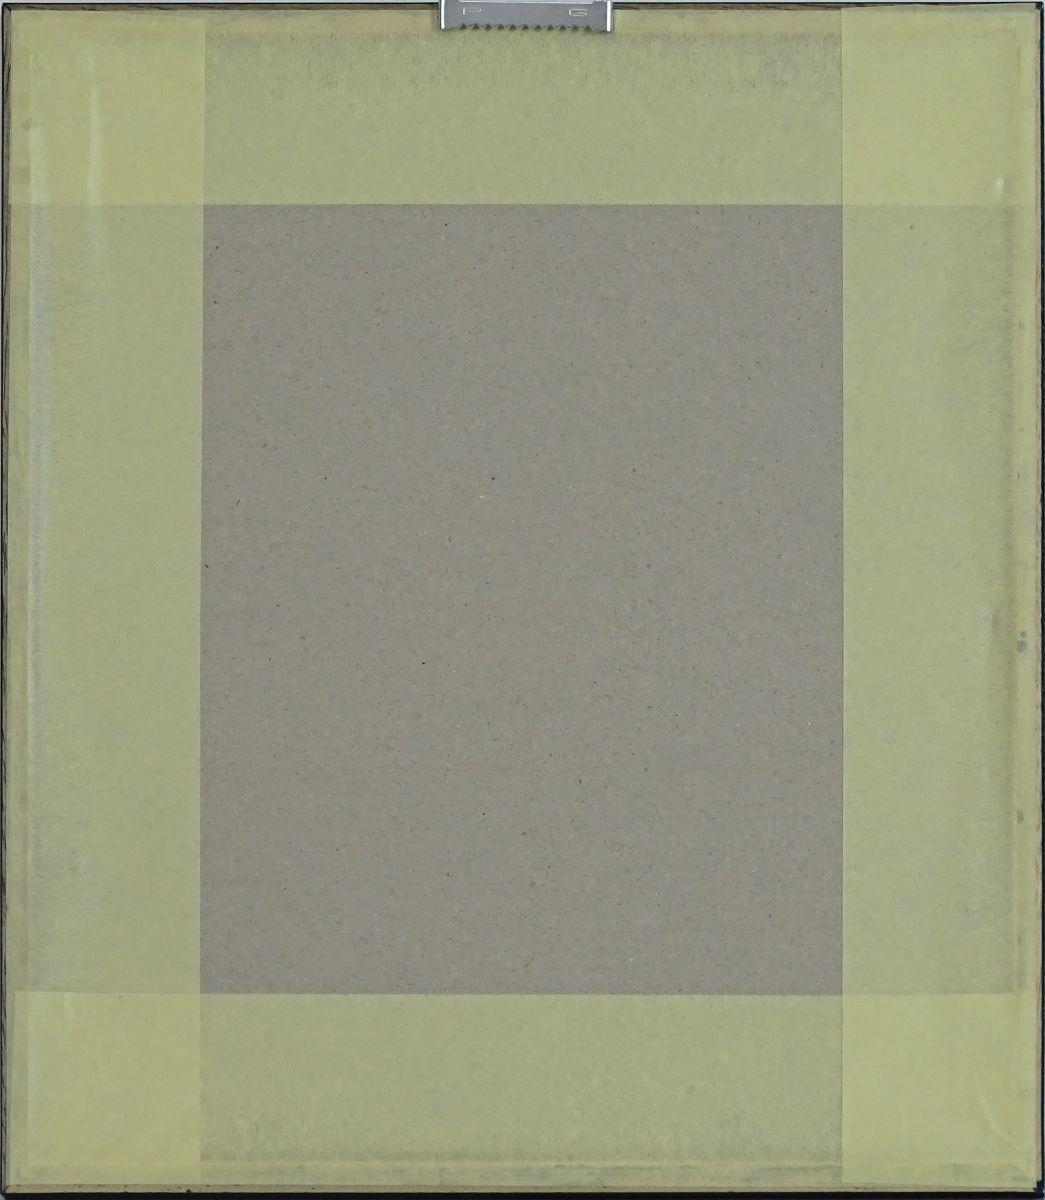 DSC06698.JPG (1045×1200)